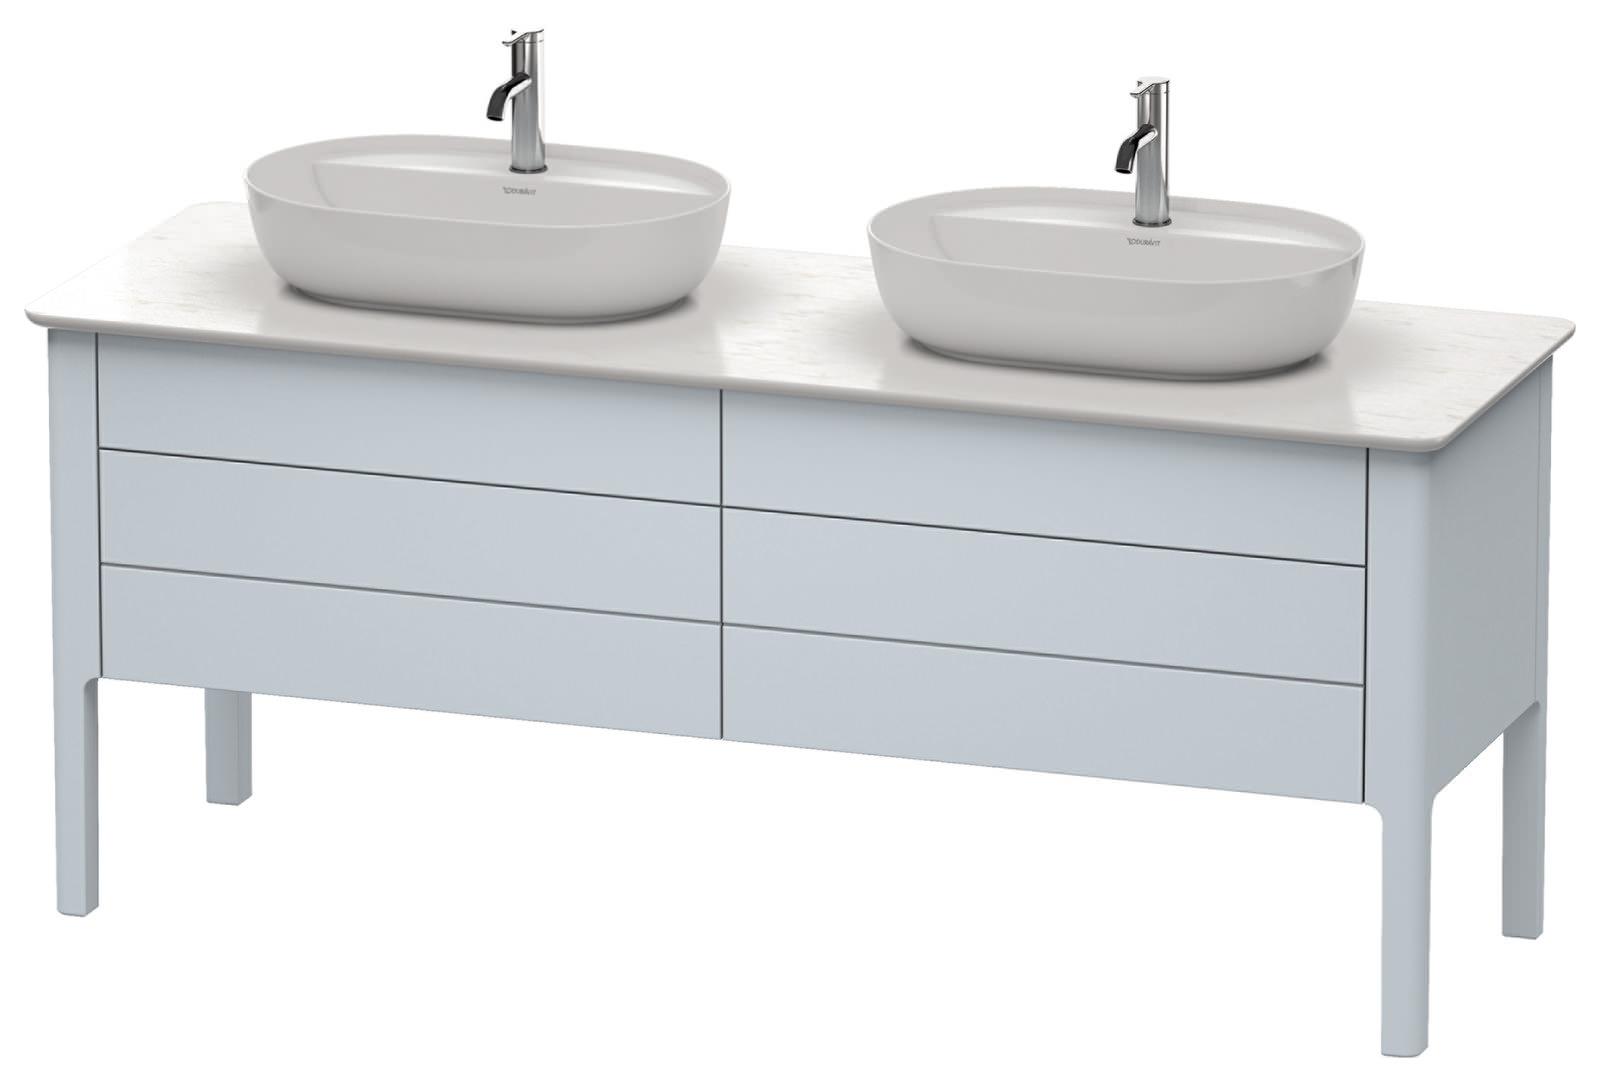 Duravit Luv 1733 x 570mm 2 Drawer Floorstanding Unit